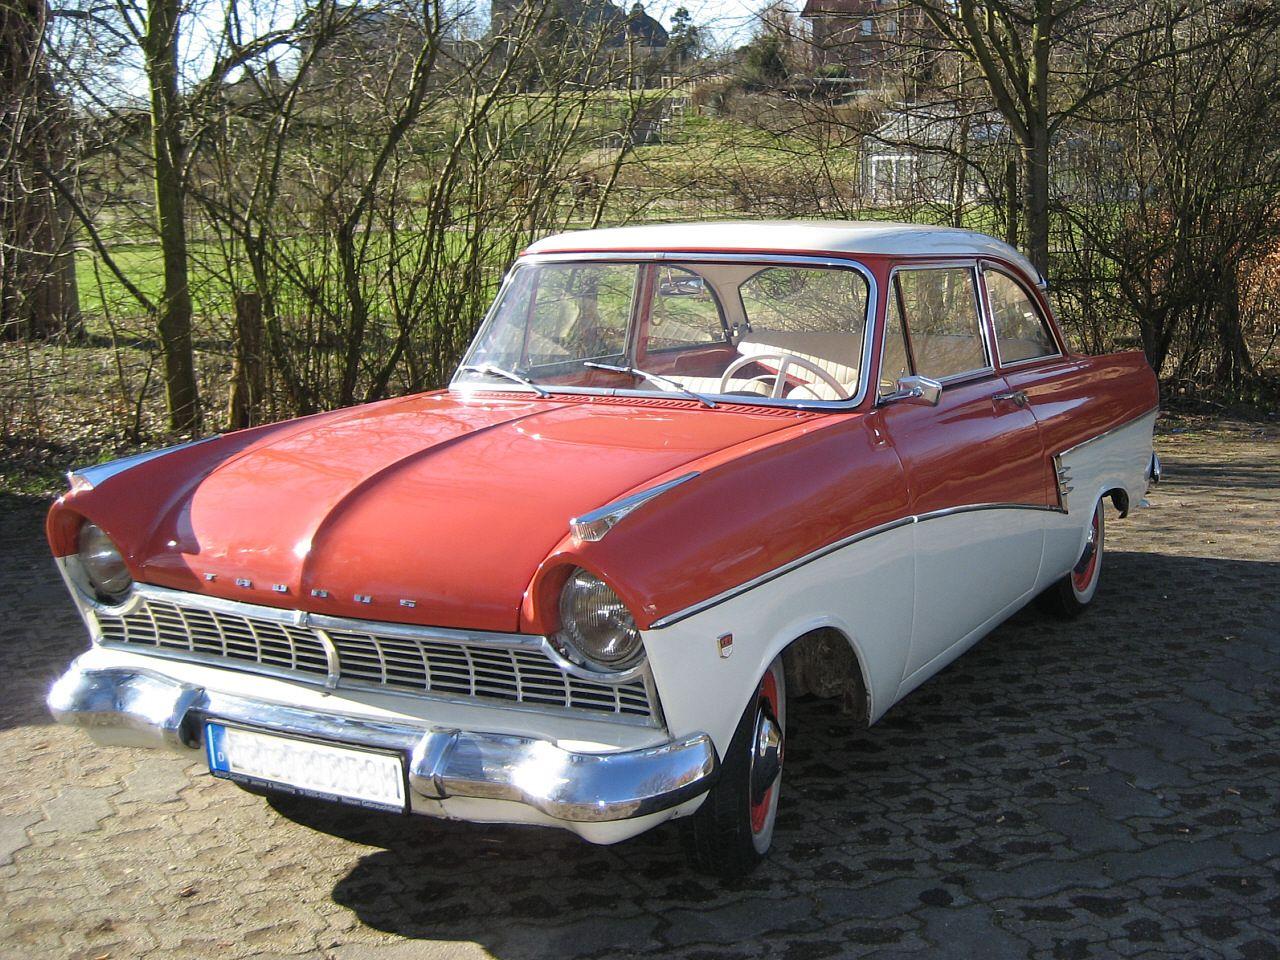 1958 ford taunus 17 m de luxe p2 interior ford. Black Bedroom Furniture Sets. Home Design Ideas